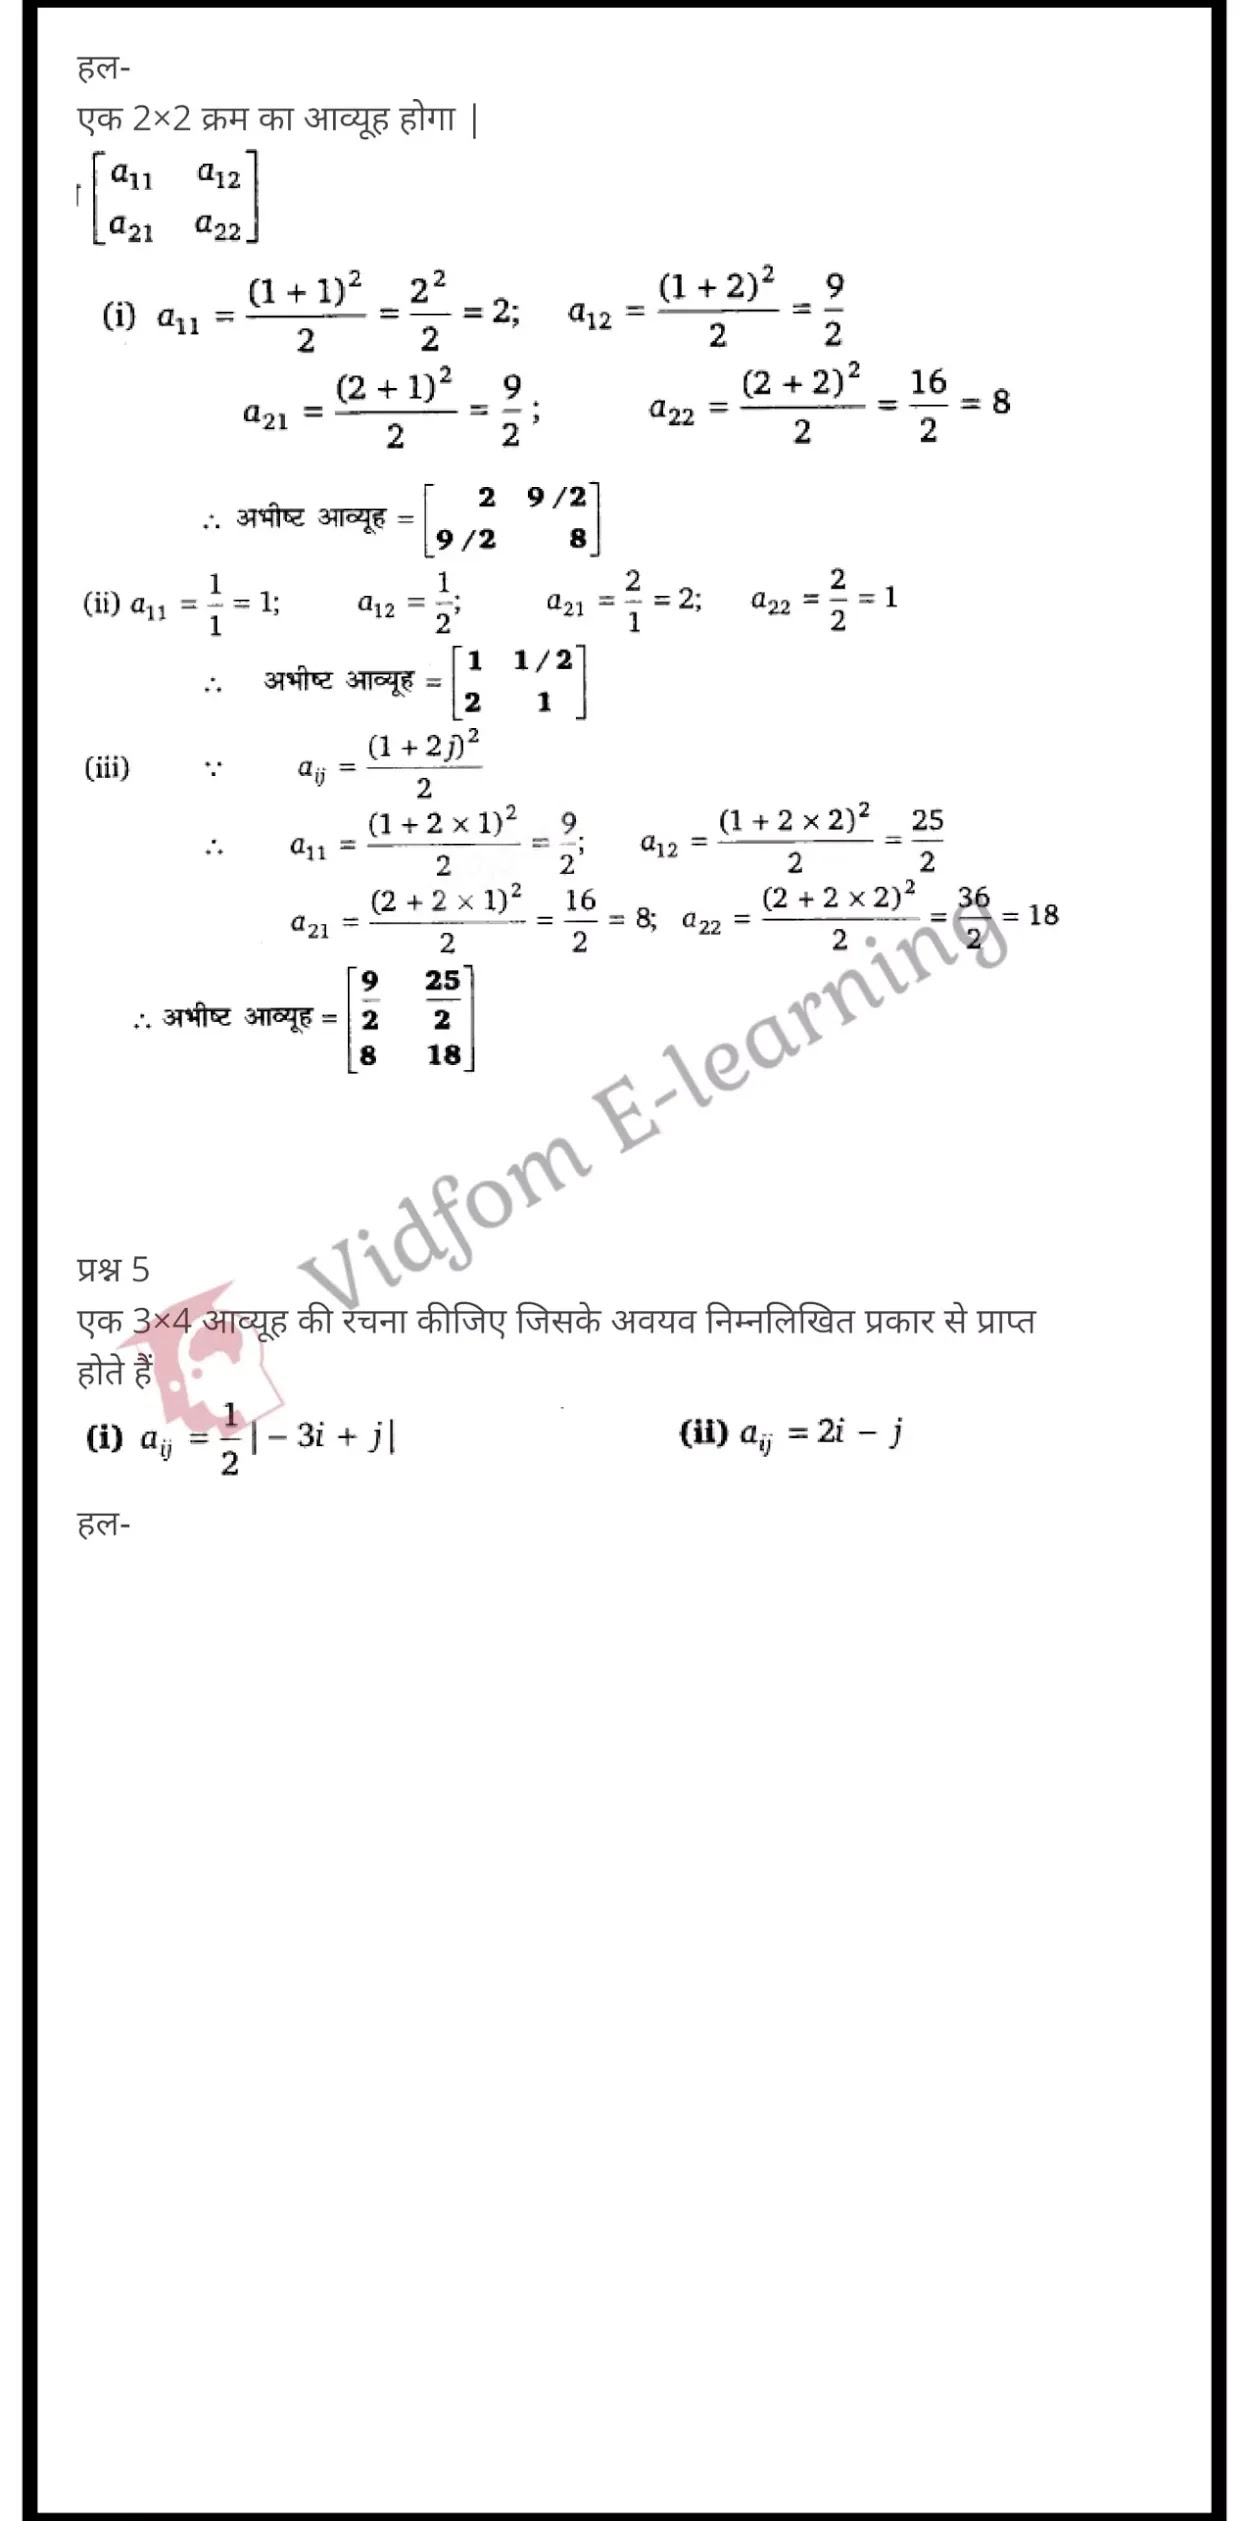 कक्षा 12 गणित  के नोट्स  हिंदी में एनसीईआरटी समाधान,     class 12 Maths Chapter 3,   class 12 Maths Chapter 3 ncert solutions in Hindi,   class 12 Maths Chapter 3 notes in hindi,   class 12 Maths Chapter 3 question answer,   class 12 Maths Chapter 3 notes,   class 12 Maths Chapter 3 class 12 Maths Chapter 3 in  hindi,    class 12 Maths Chapter 3 important questions in  hindi,   class 12 Maths Chapter 3 notes in hindi,    class 12 Maths Chapter 3 test,   class 12 Maths Chapter 3 pdf,   class 12 Maths Chapter 3 notes pdf,   class 12 Maths Chapter 3 exercise solutions,   class 12 Maths Chapter 3 notes study rankers,   class 12 Maths Chapter 3 notes,    class 12 Maths Chapter 3  class 12  notes pdf,   class 12 Maths Chapter 3 class 12  notes  ncert,   class 12 Maths Chapter 3 class 12 pdf,   class 12 Maths Chapter 3  book,   class 12 Maths Chapter 3 quiz class 12  ,    10  th class 12 Maths Chapter 3  book up board,   up board 10  th class 12 Maths Chapter 3 notes,  class 12 Maths,   class 12 Maths ncert solutions in Hindi,   class 12 Maths notes in hindi,   class 12 Maths question answer,   class 12 Maths notes,  class 12 Maths class 12 Maths Chapter 3 in  hindi,    class 12 Maths important questions in  hindi,   class 12 Maths notes in hindi,    class 12 Maths test,  class 12 Maths class 12 Maths Chapter 3 pdf,   class 12 Maths notes pdf,   class 12 Maths exercise solutions,   class 12 Maths,  class 12 Maths notes study rankers,   class 12 Maths notes,  class 12 Maths notes,   class 12 Maths  class 12  notes pdf,   class 12 Maths class 12  notes  ncert,   class 12 Maths class 12 pdf,   class 12 Maths  book,  class 12 Maths quiz class 12  ,  10  th class 12 Maths    book up board,    up board 10  th class 12 Maths notes,      कक्षा 12 गणित अध्याय 3 ,  कक्षा 12 गणित, कक्षा 12 गणित अध्याय 3  के नोट्स हिंदी में,  कक्षा 12 का हिंदी अध्याय 3 का प्रश्न उत्तर,  कक्षा 12 गणित अध्याय 3 के नोट्स,  10 कक्षा गणित  हिंदी में, कक्षा 12 गणित अध्याय 3  हिंदी में,  कक्षा 12 गणित अध्याय